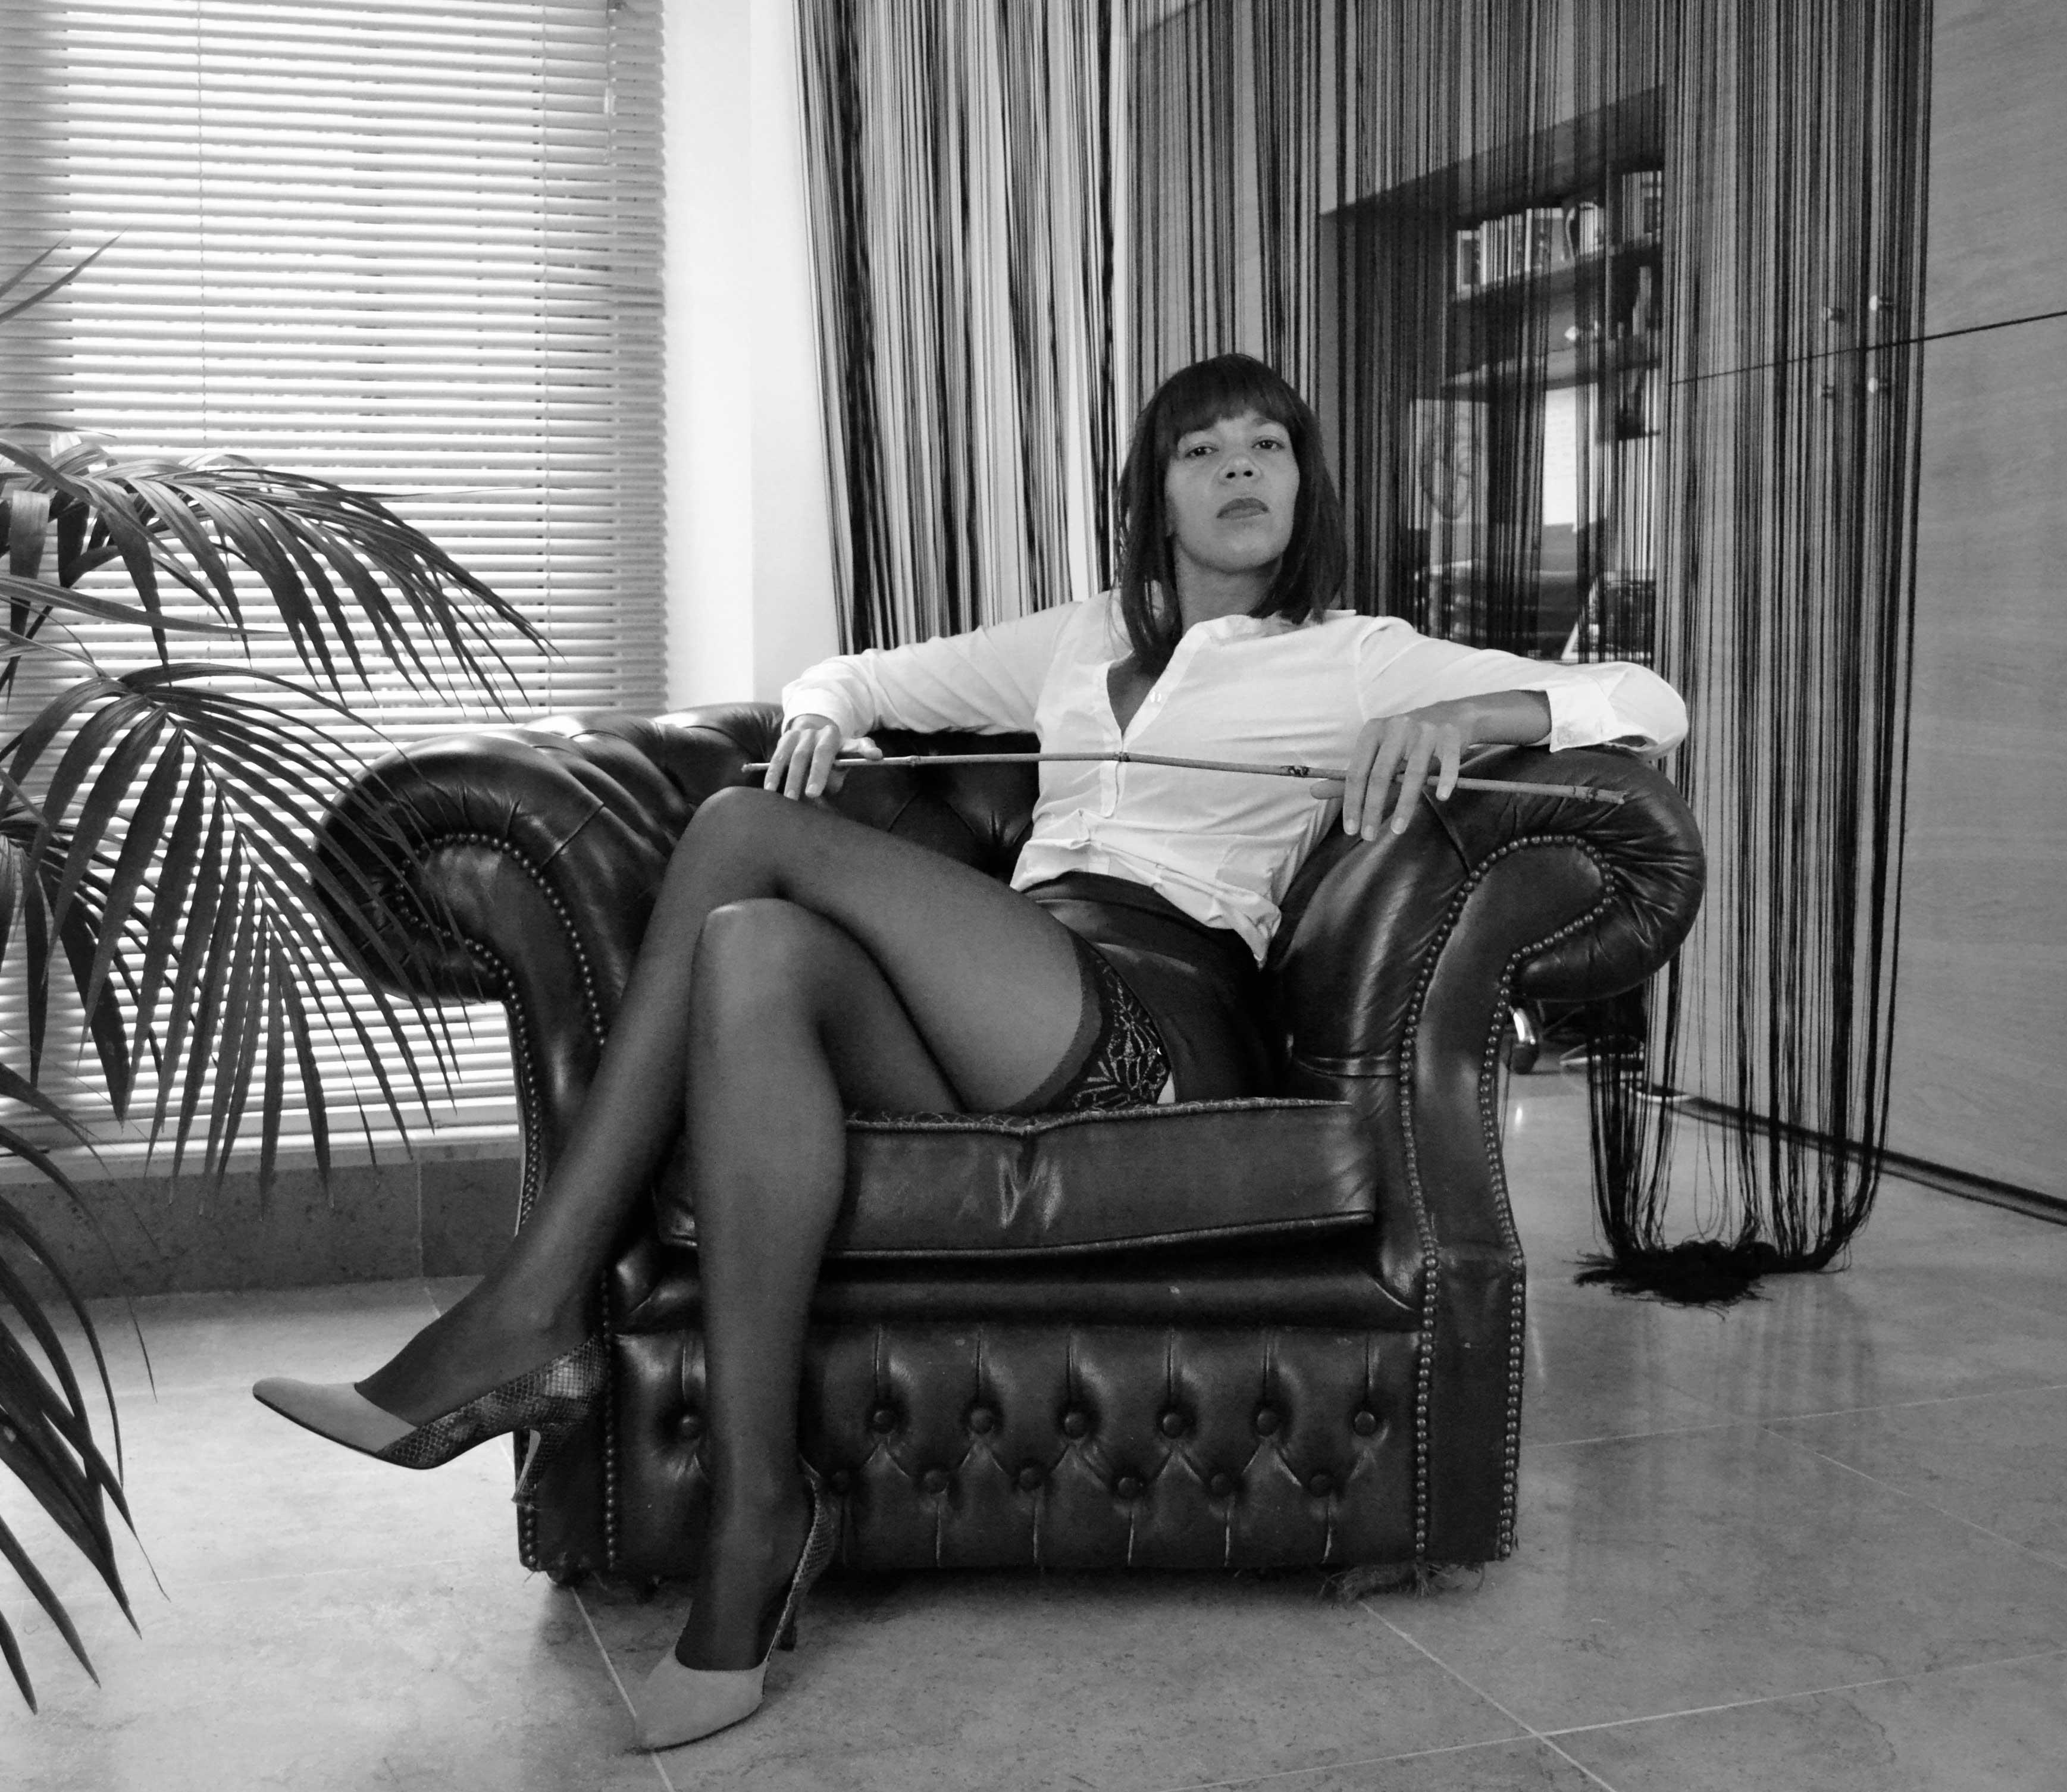 female-domination-central-london-fetish-services-dominatrix